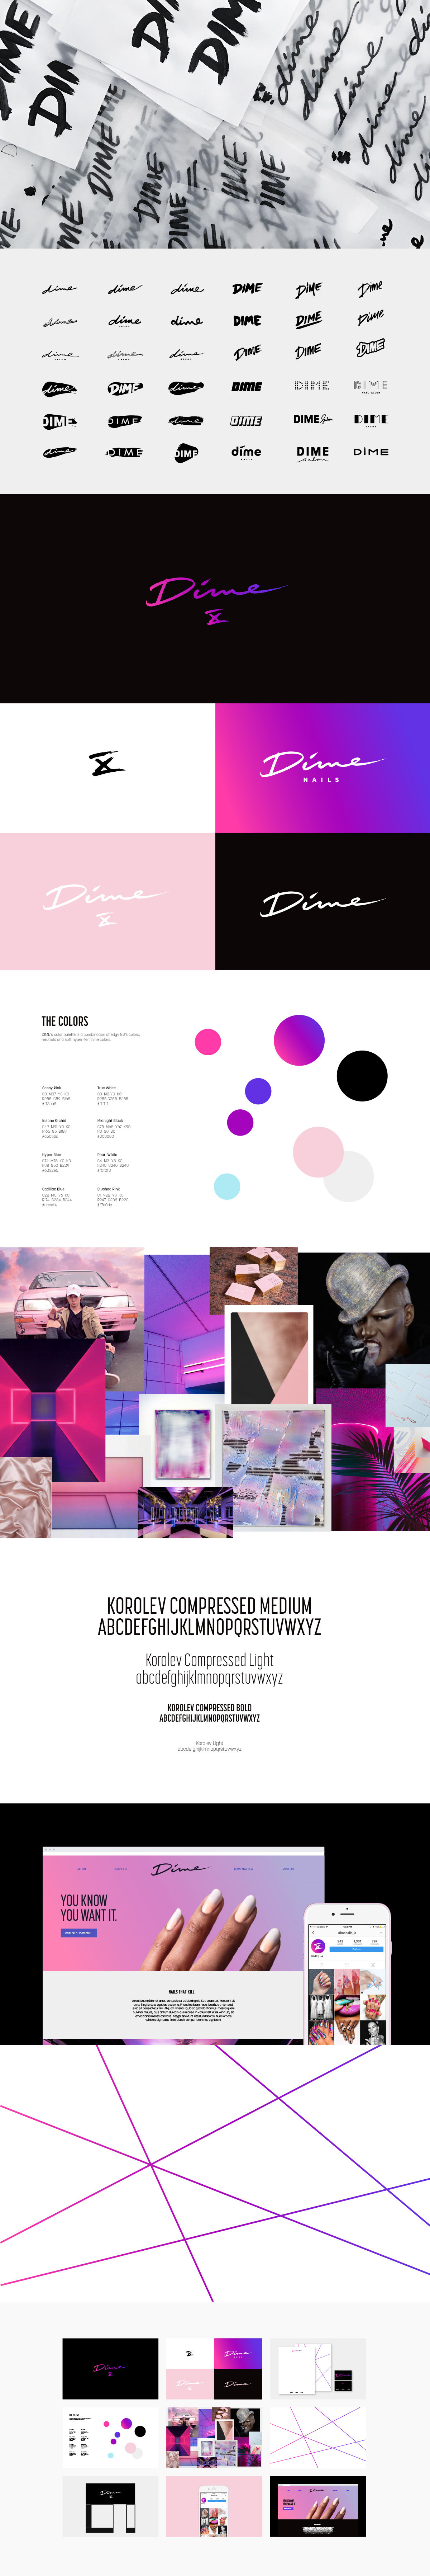 dime_branding_4.jpg